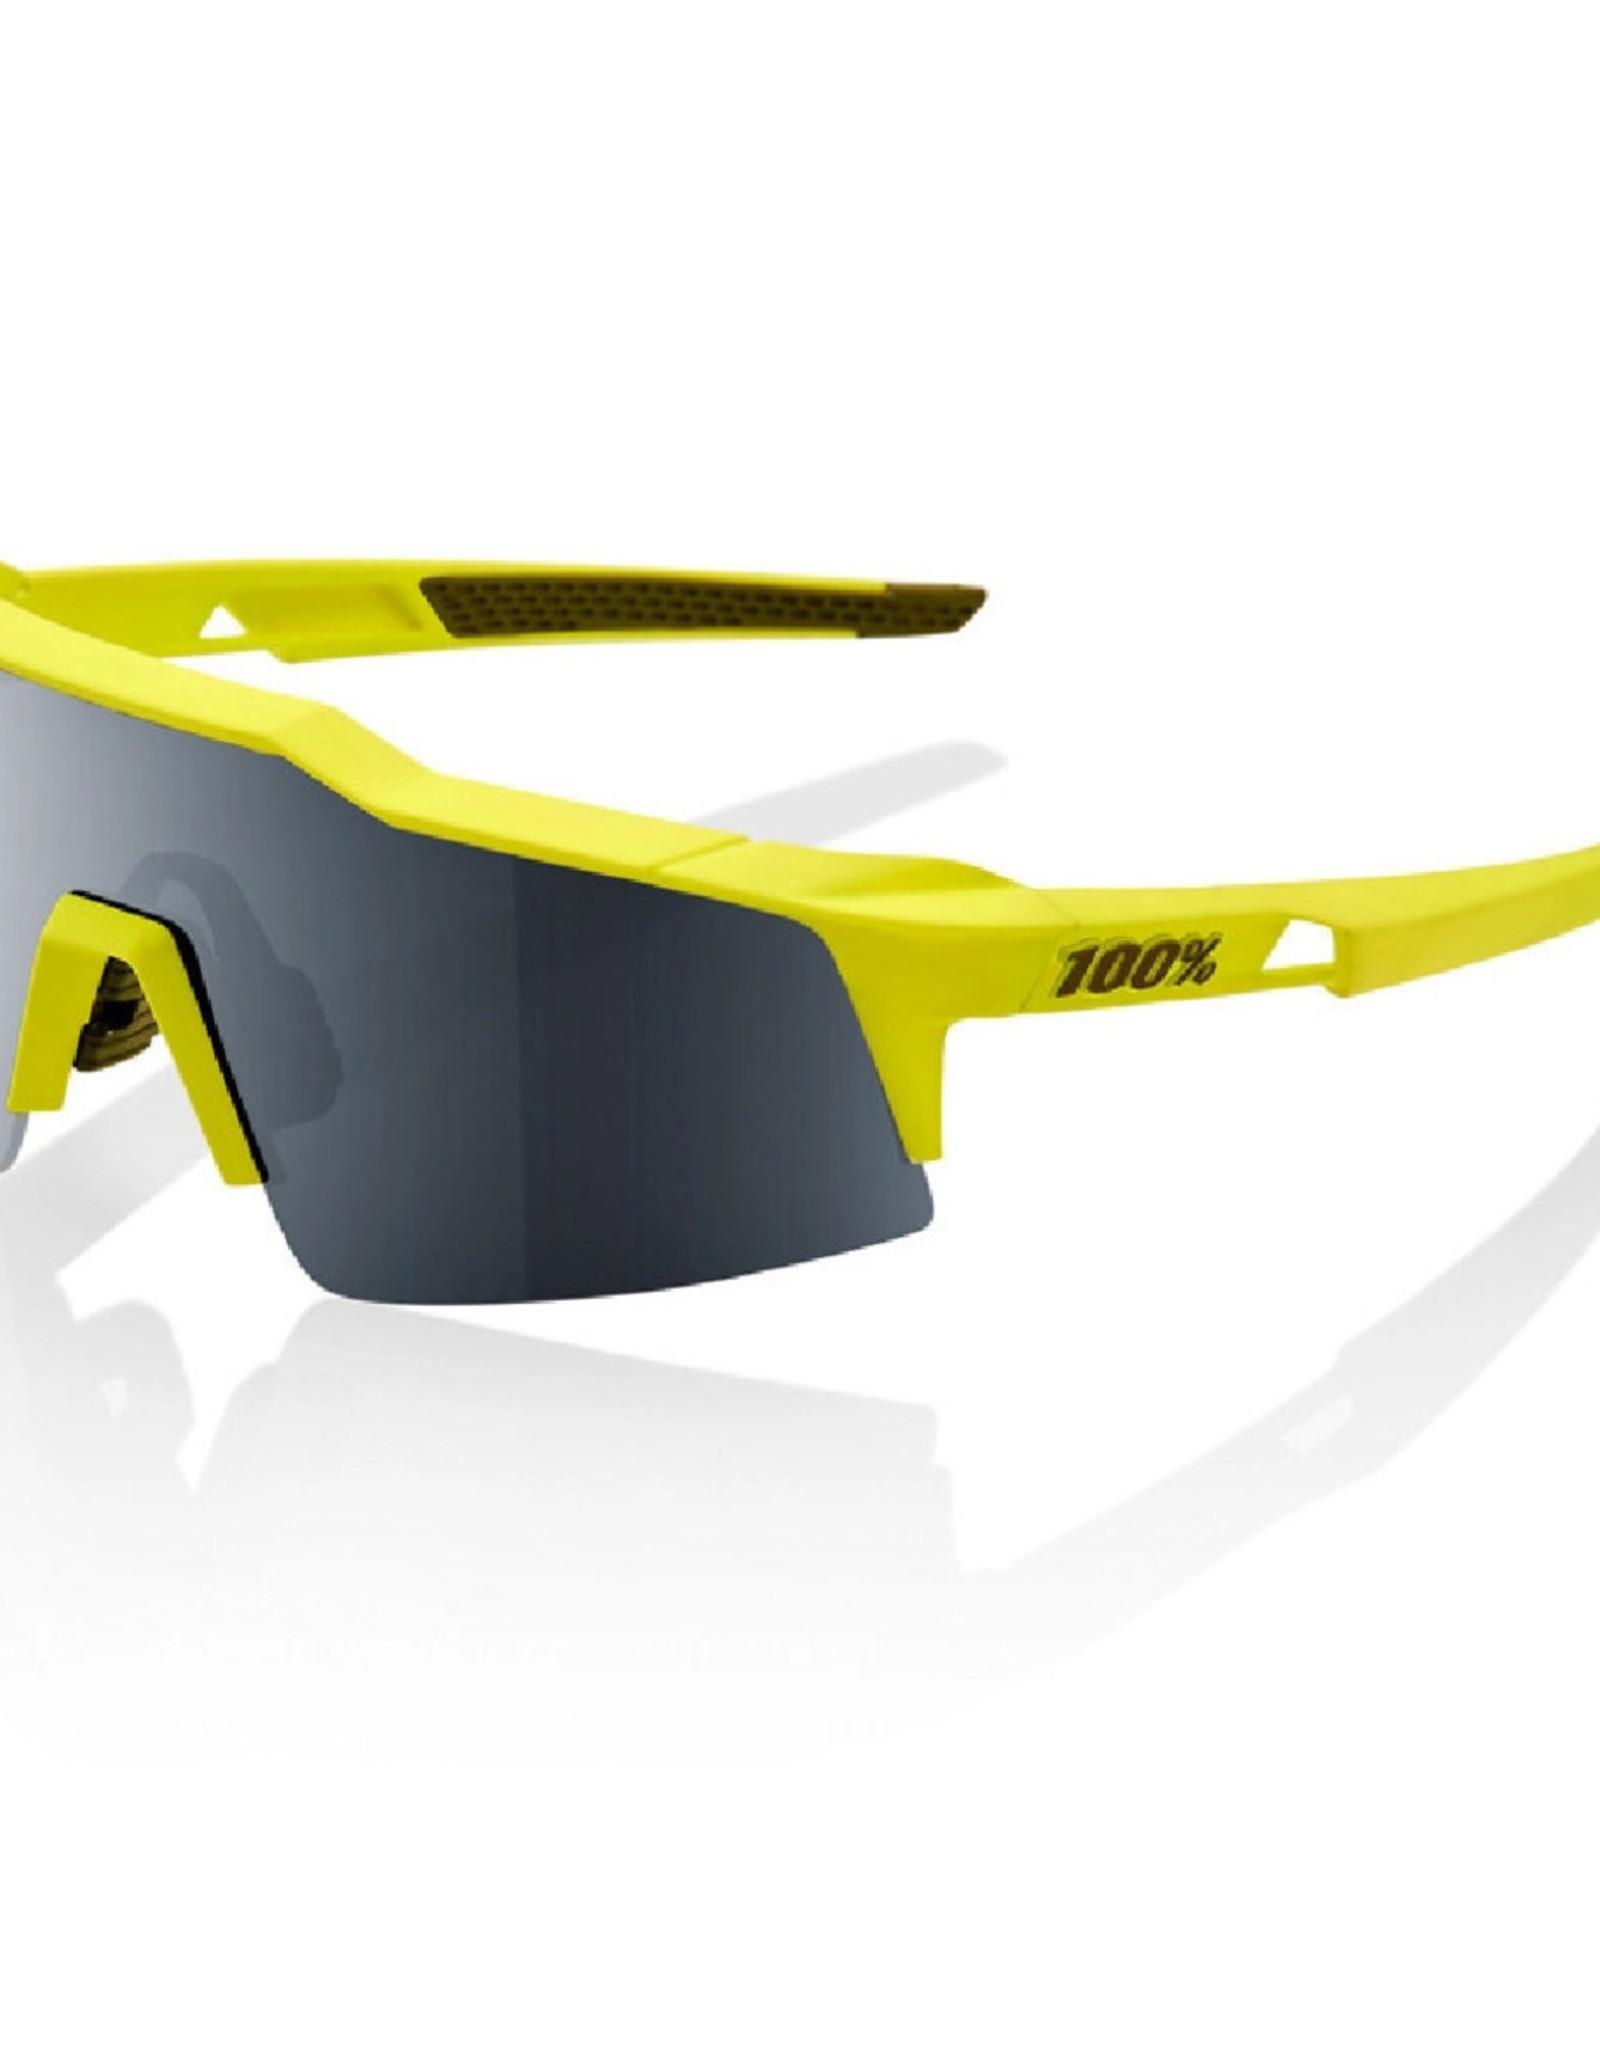 100% SpeedCraft SL Sunglasses, Soft Tact Banana frame - Black Mirror Lens